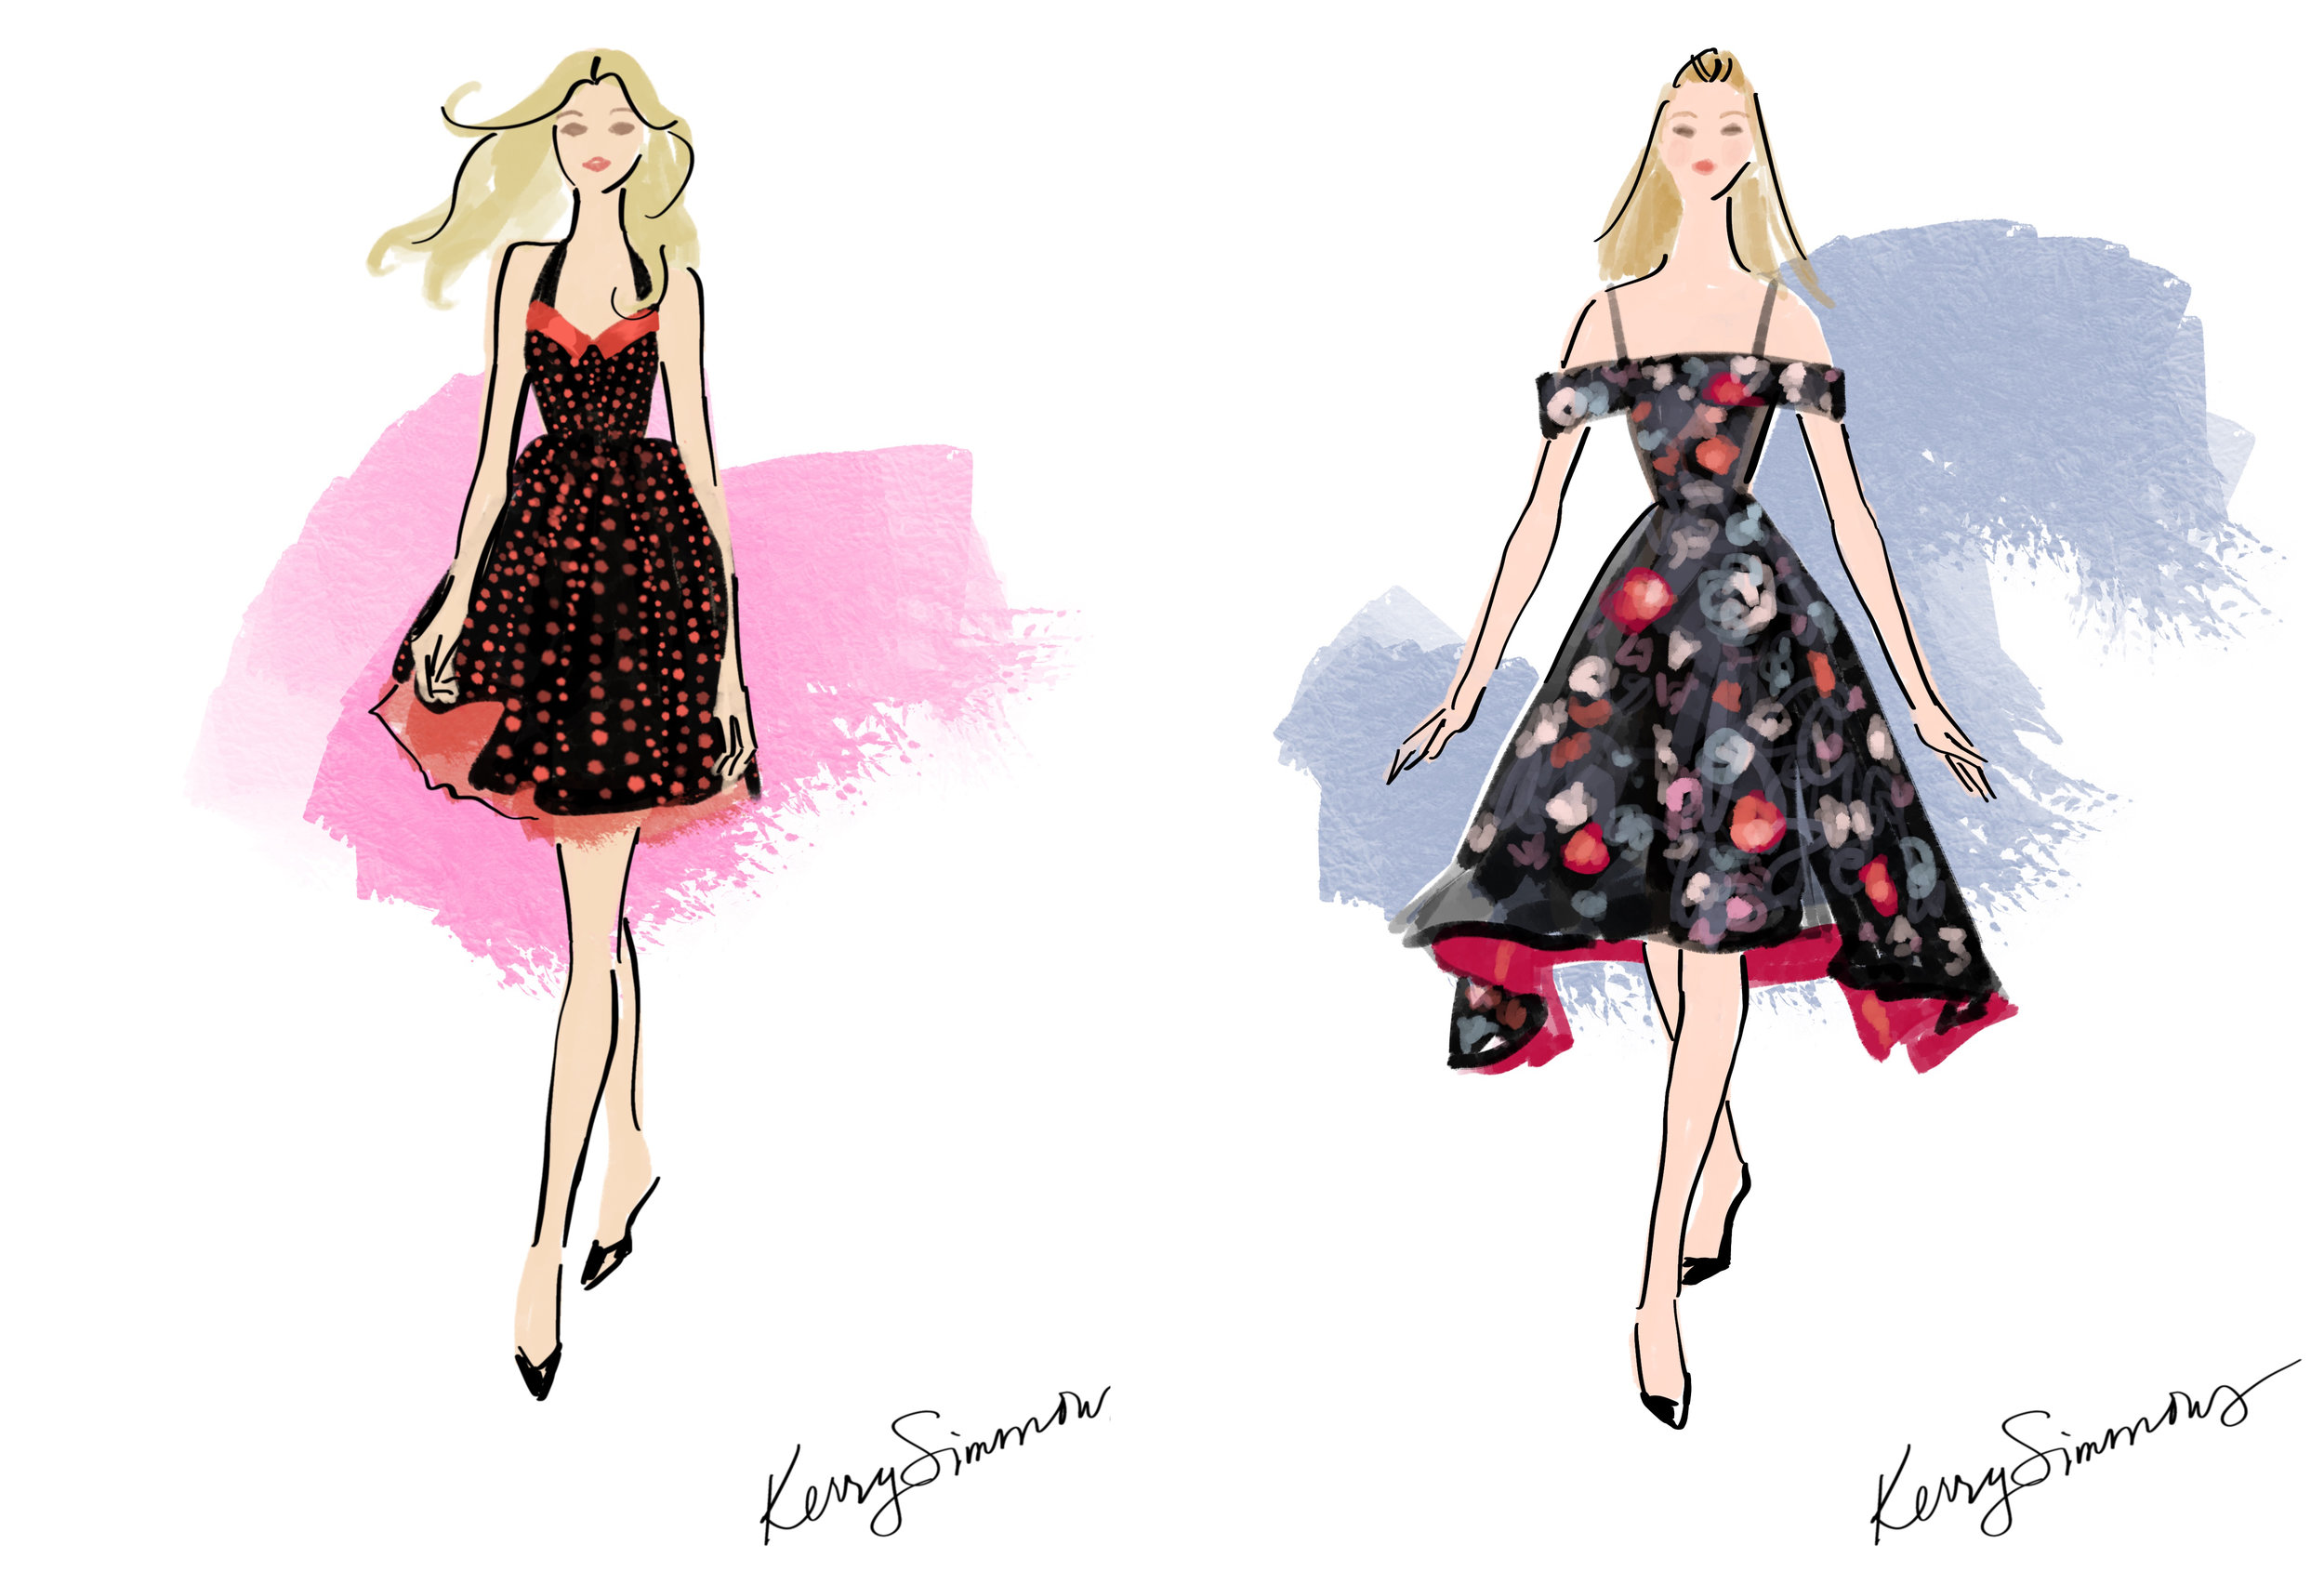 kerry fashion sketch.jpg